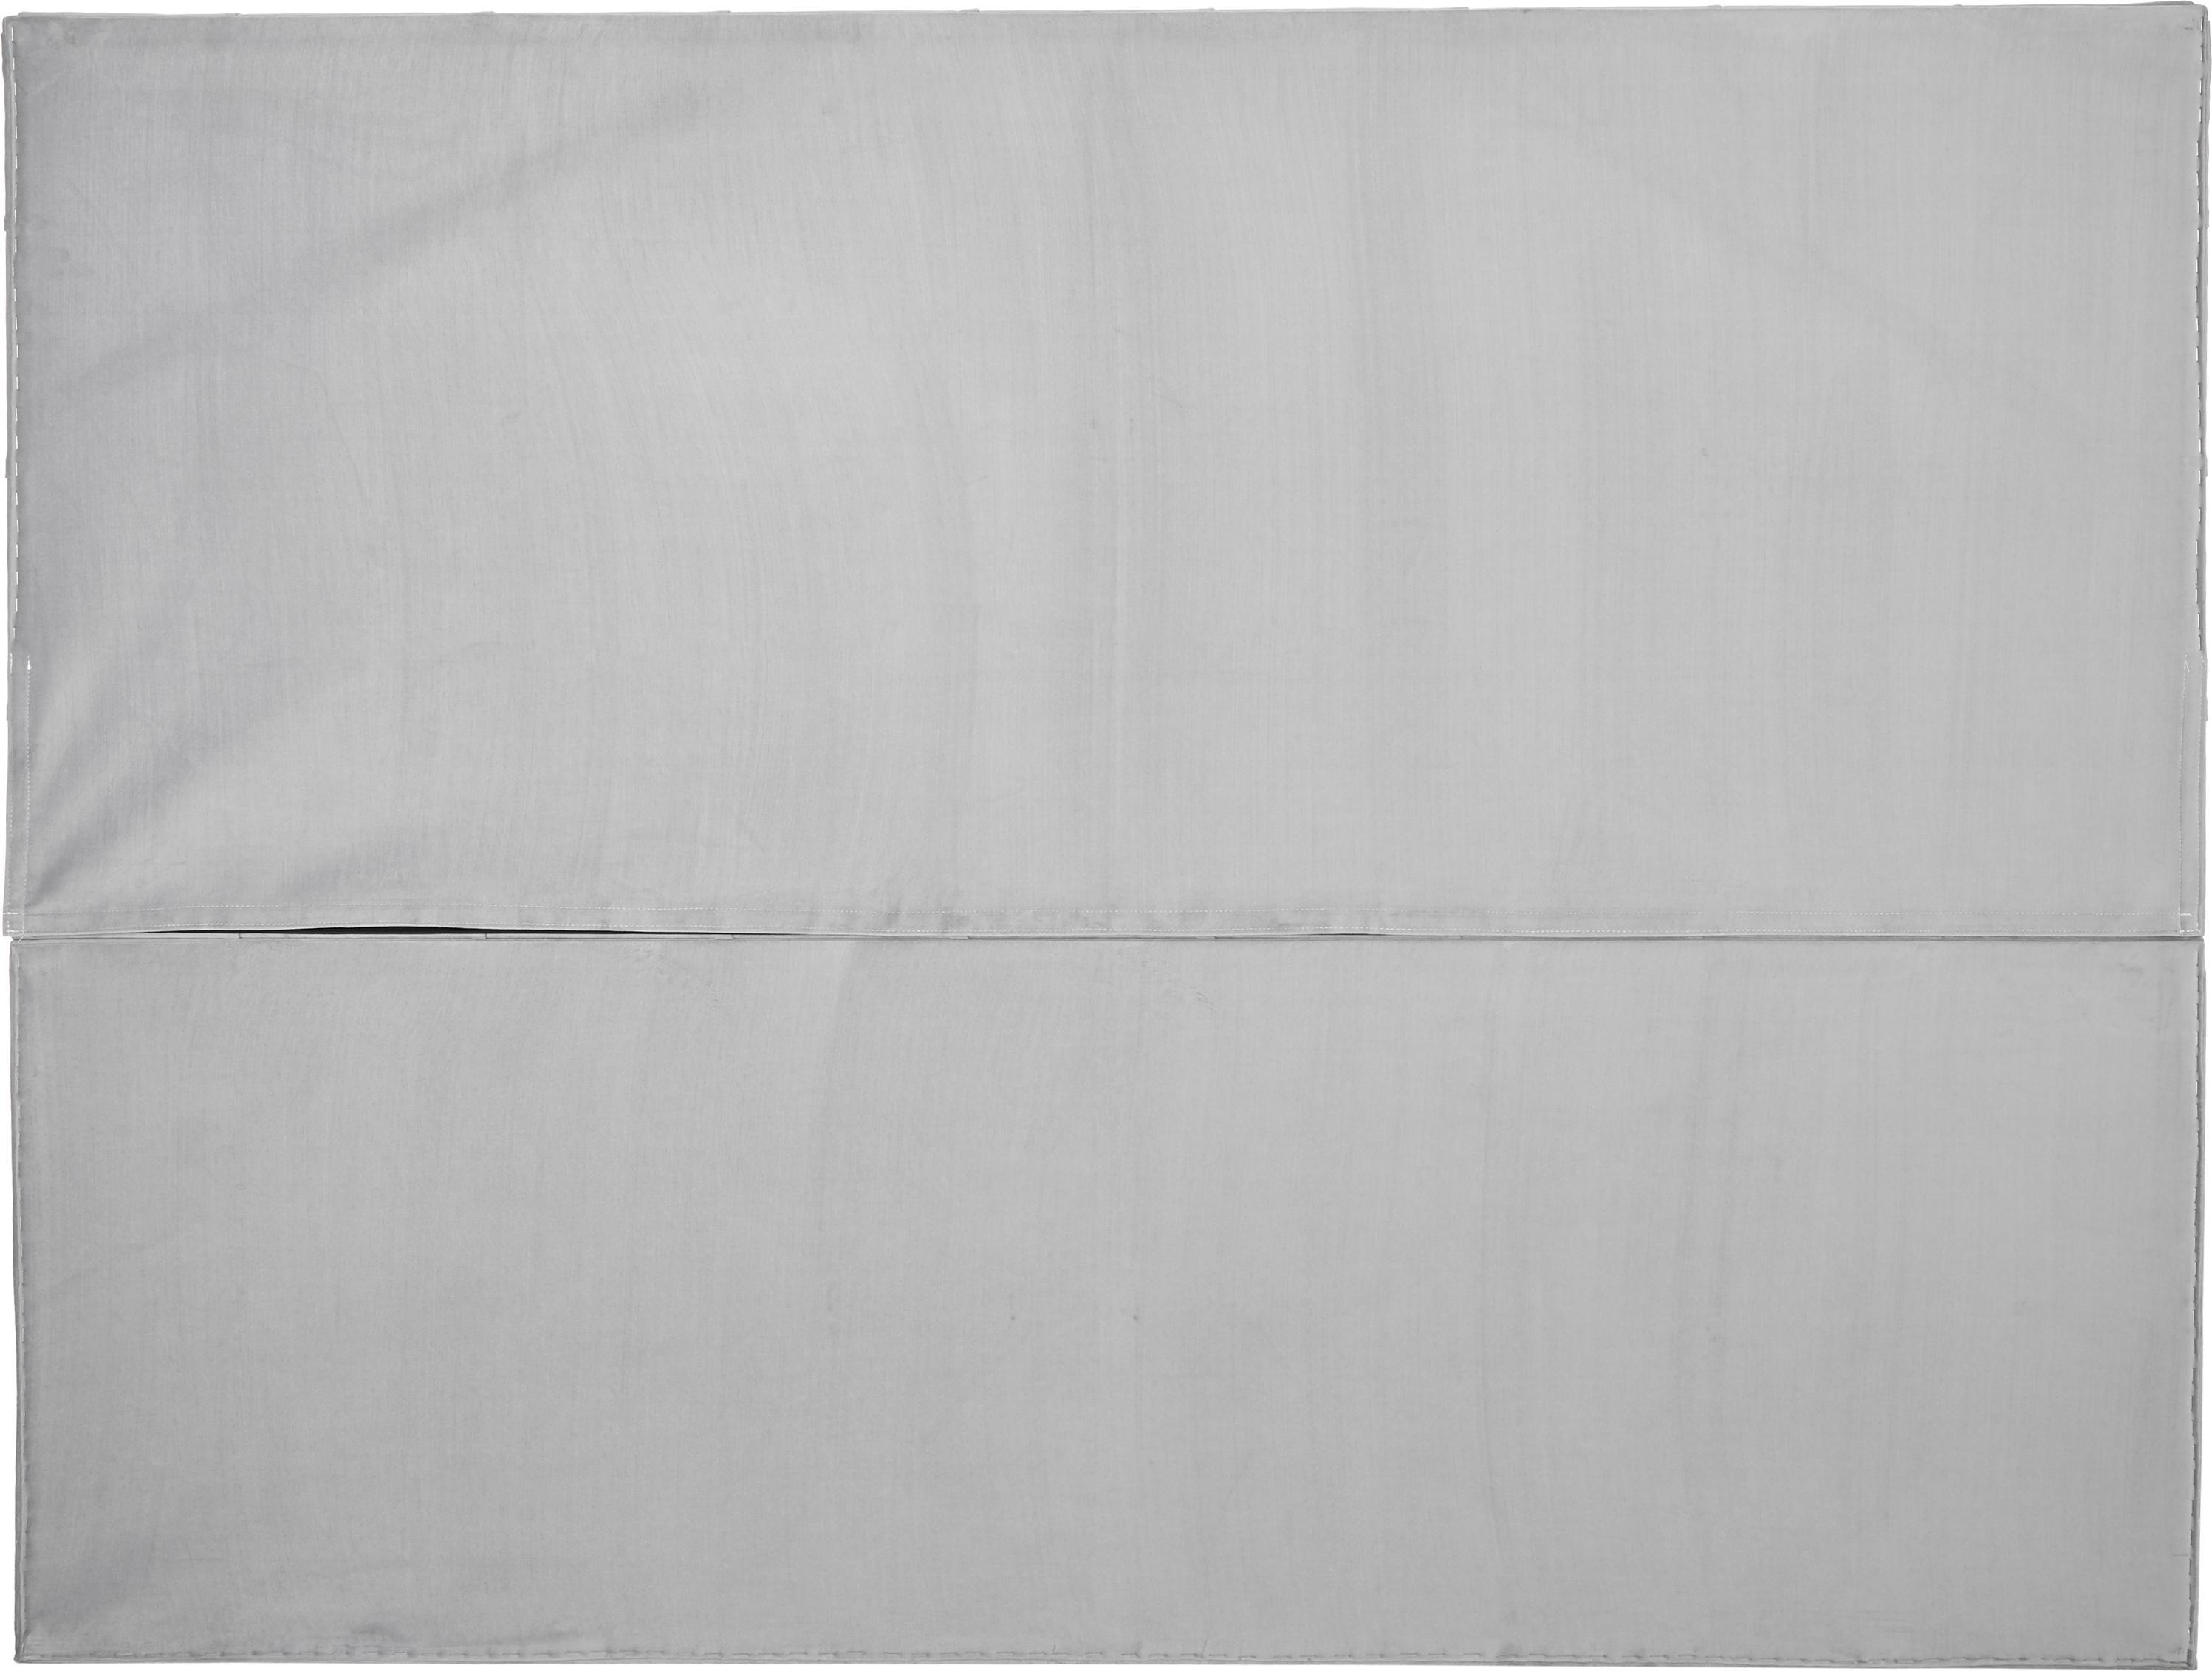 Premium fluwelen boxspring bed Phoebe, Matras: 7-zones-pocketveringkern , Poten: massief gelakt beukenhout, Lichtgrijs, 200 x 200 cm